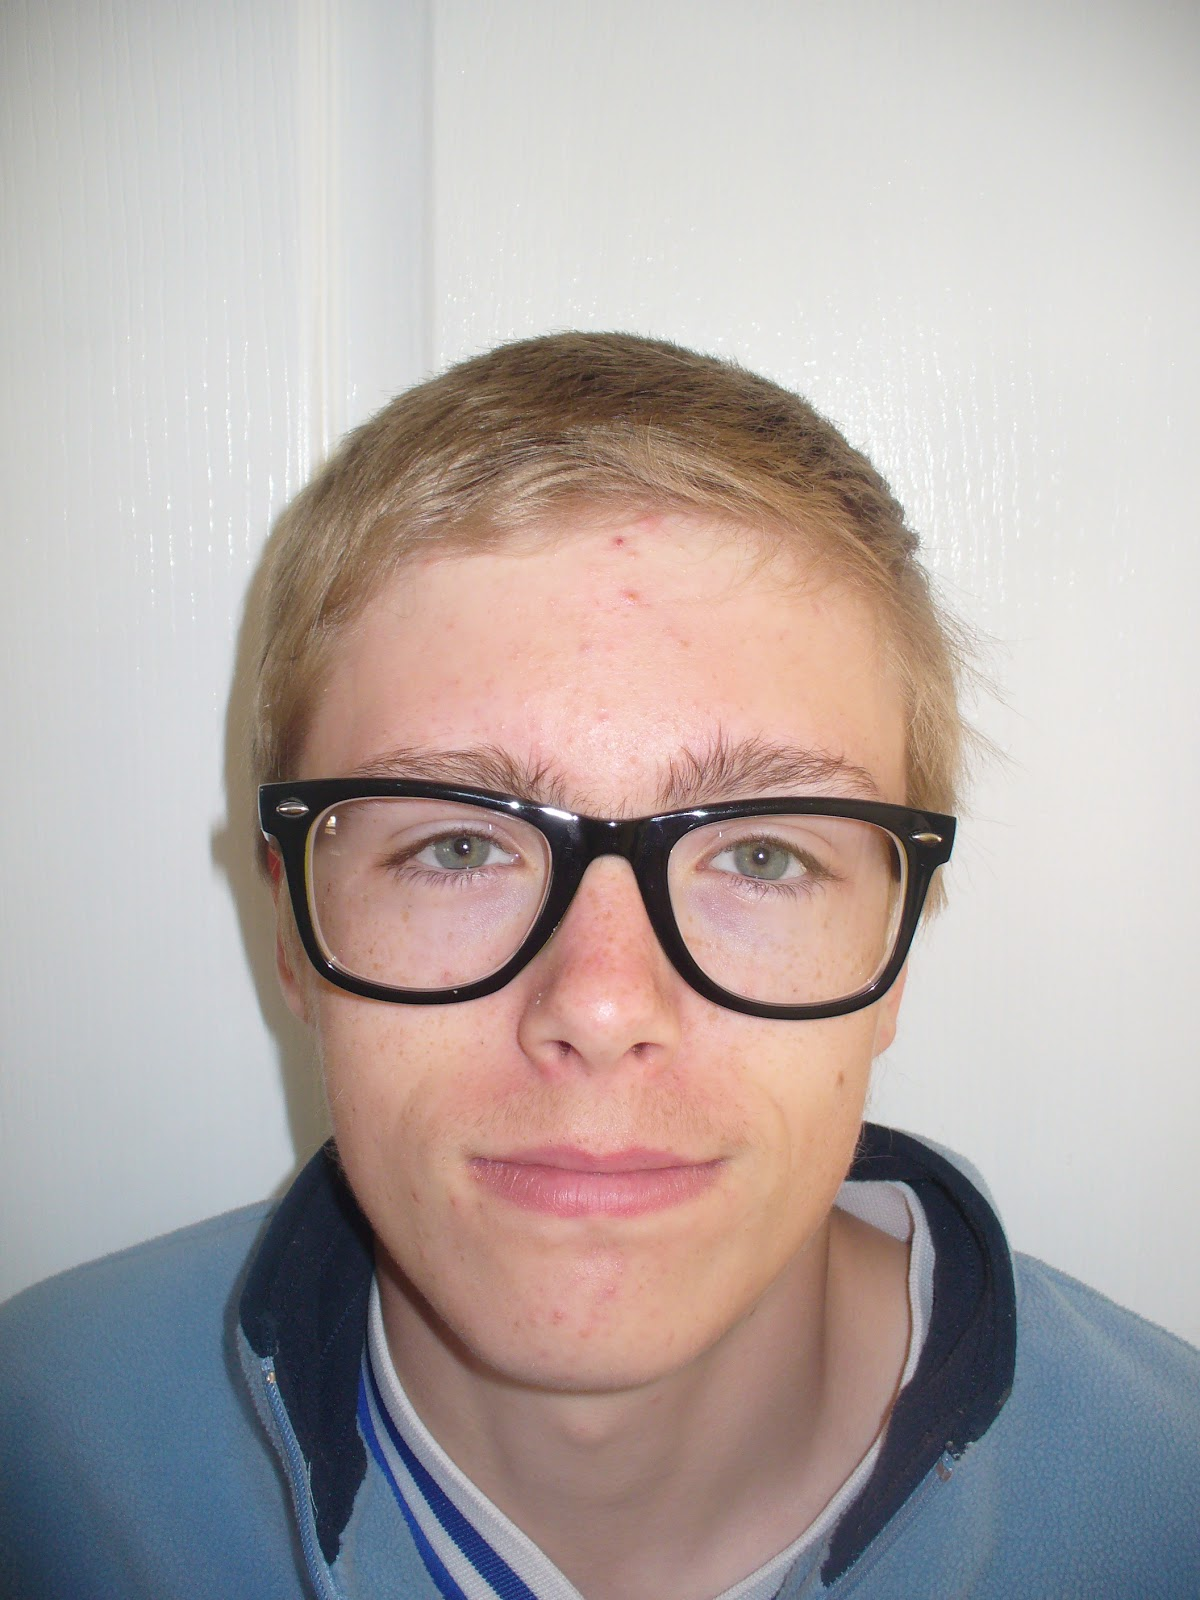 Hipster Glasses Zenni Optical : Shut The Fridge: March 2013